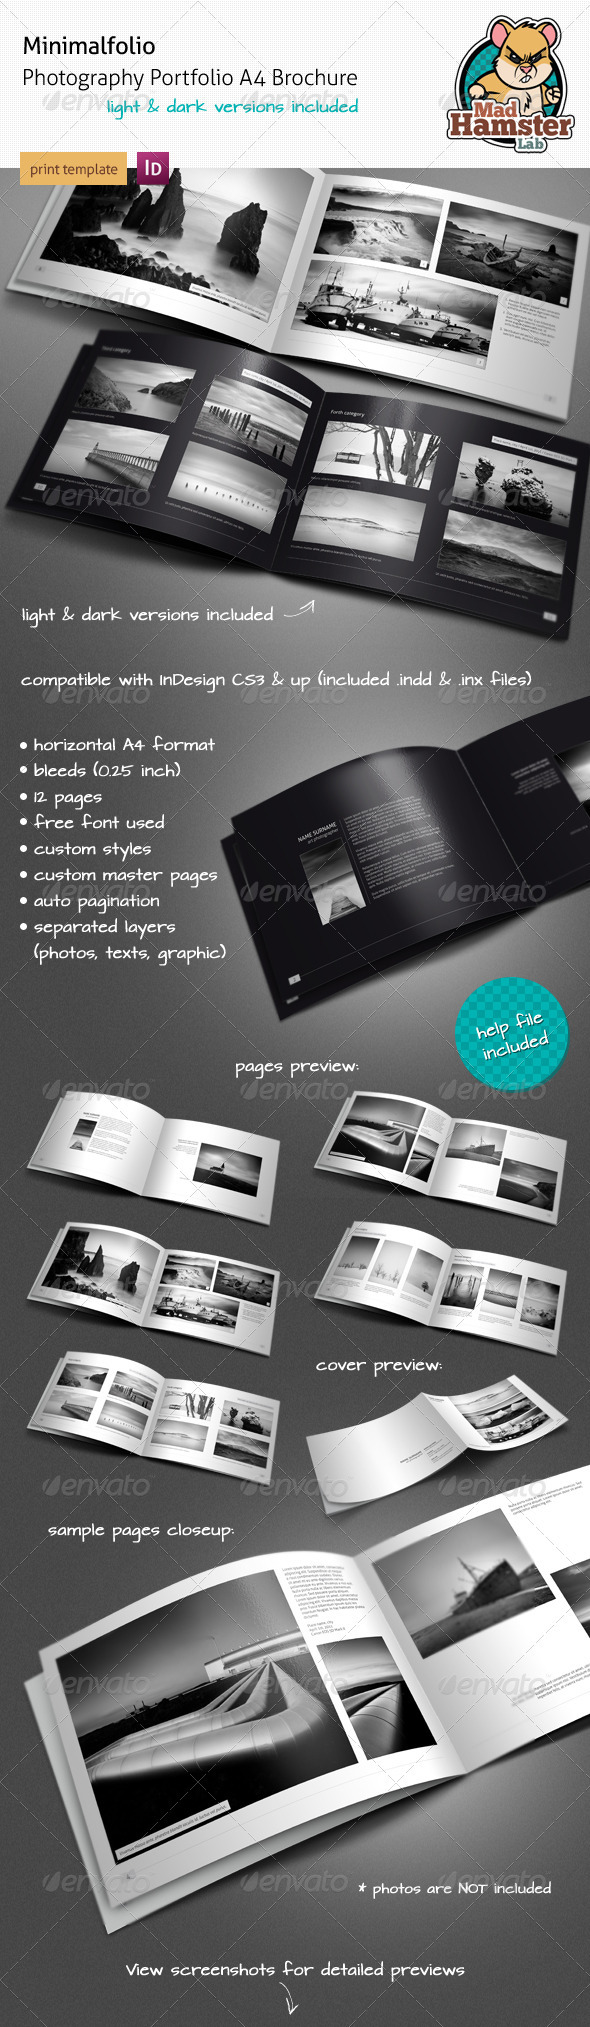 GraphicRiver Minimalfolio Photography Portfolio A4 Brochure 1664392